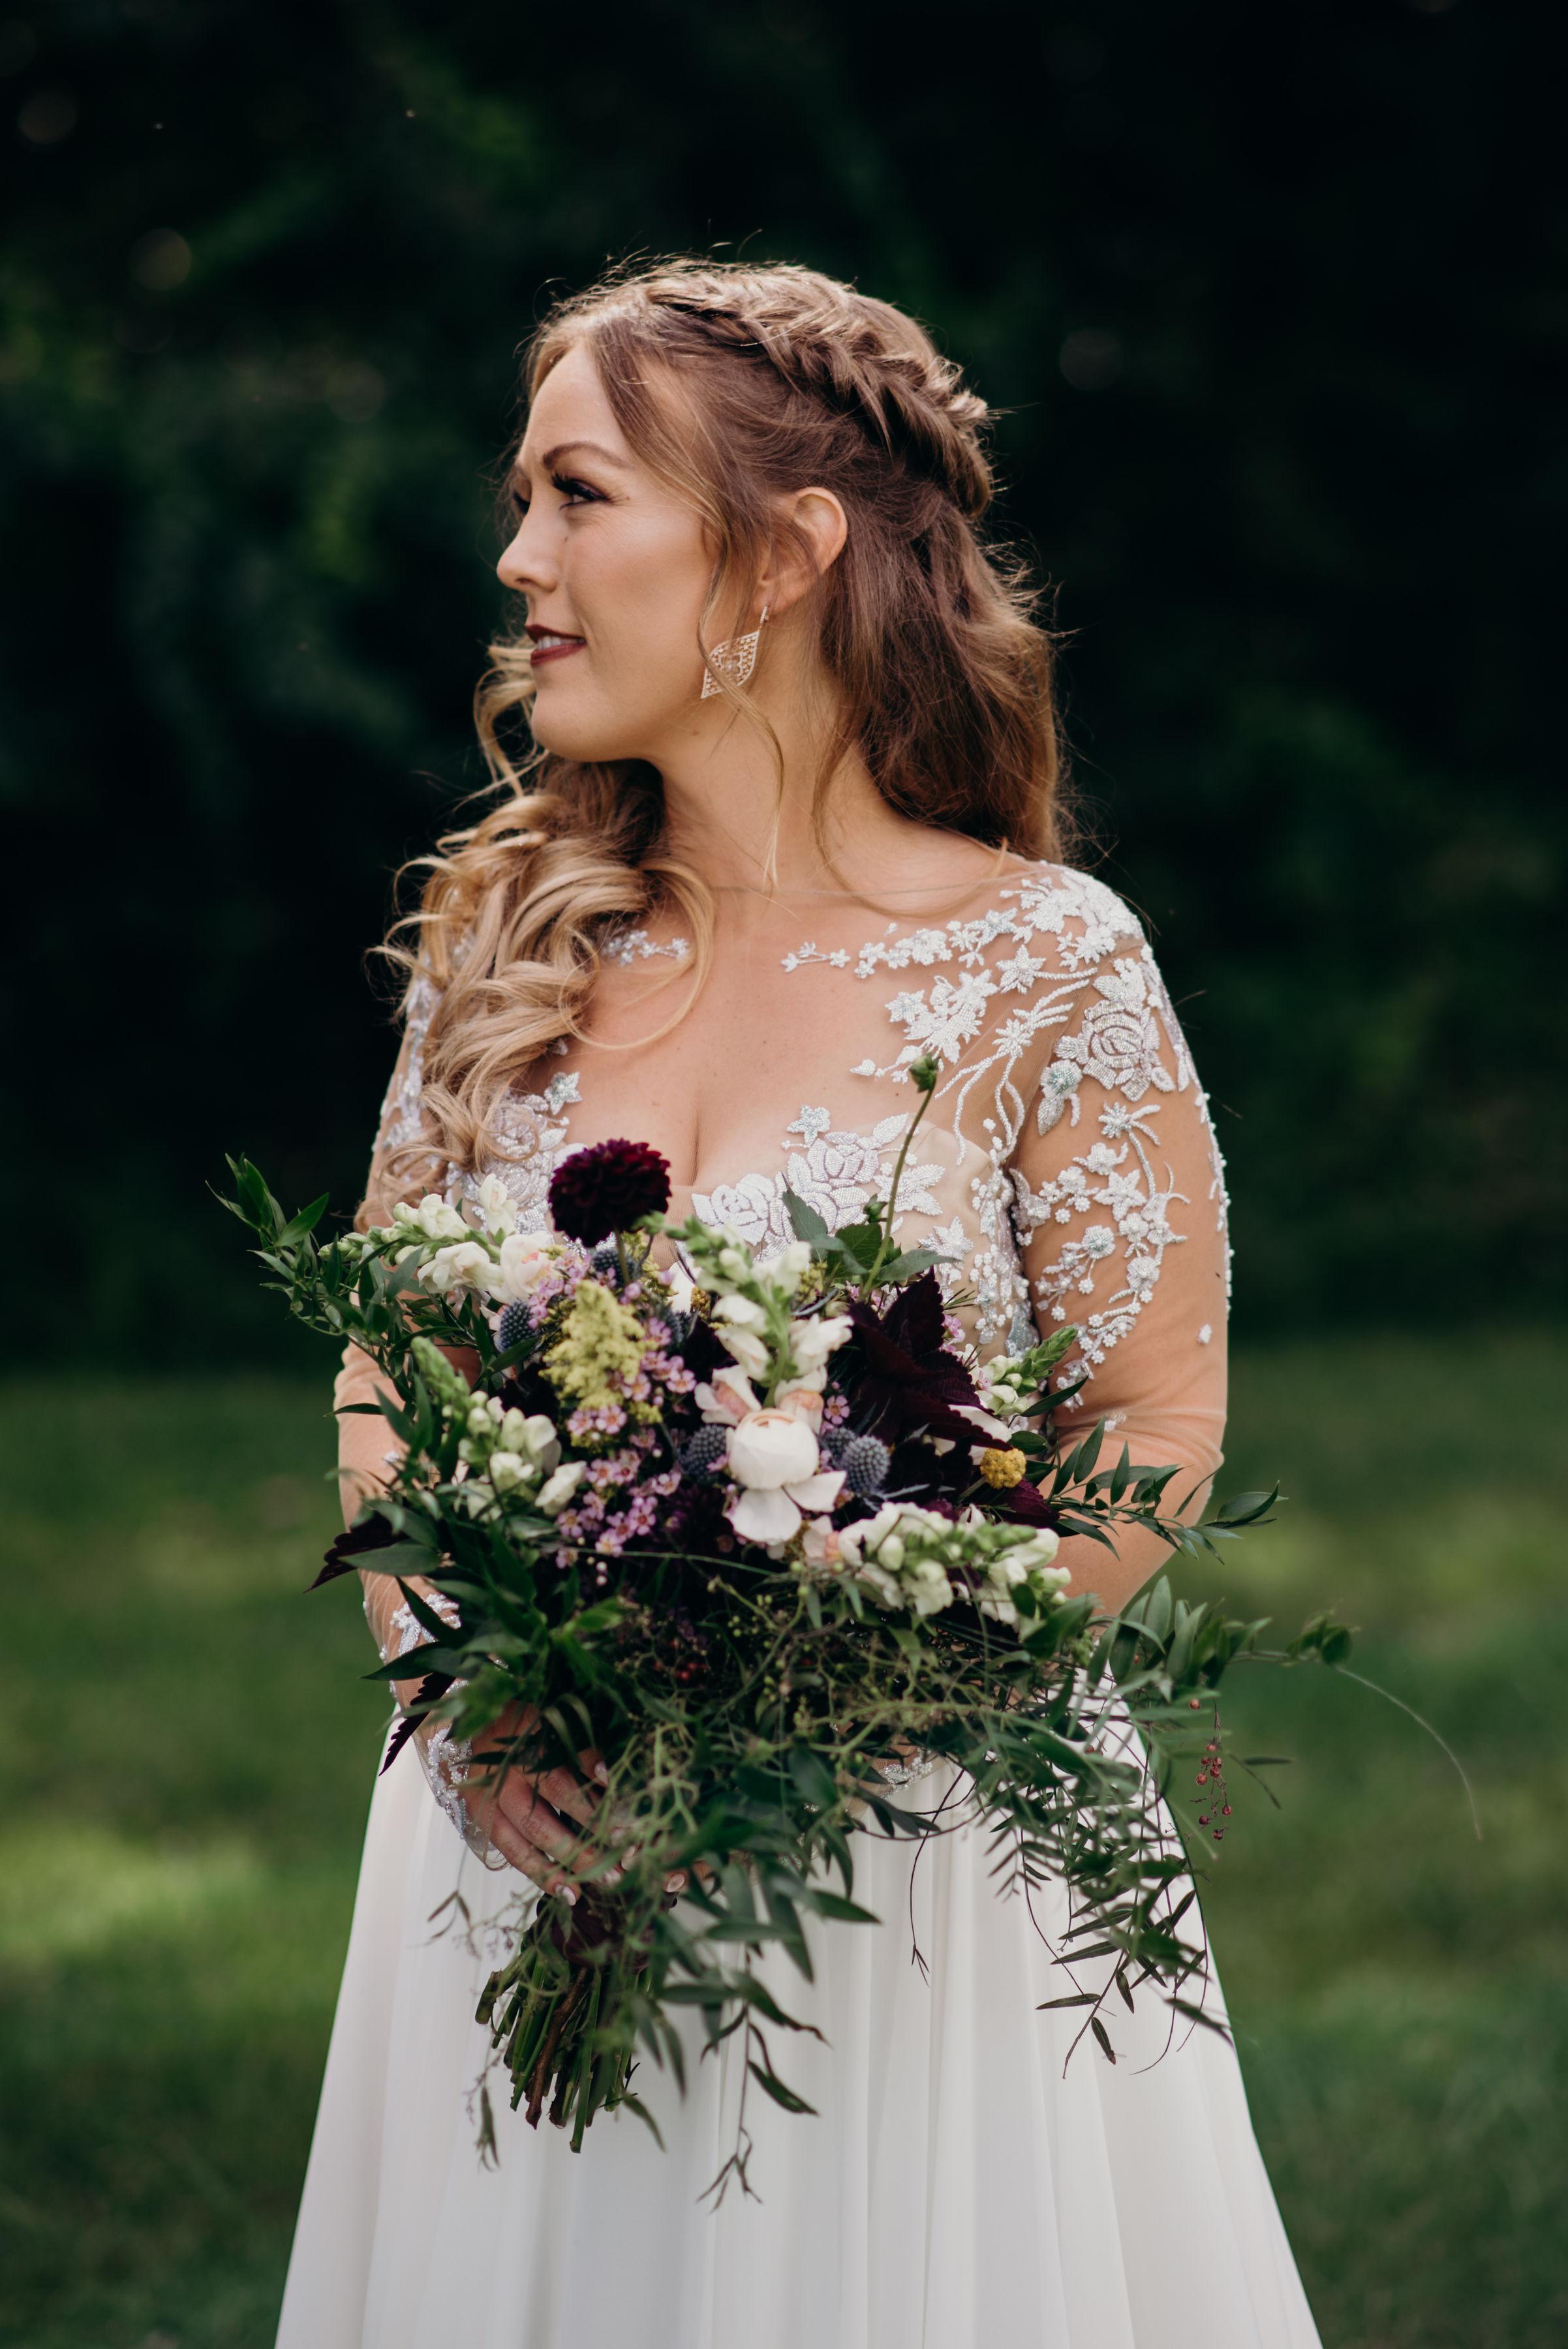 ryan-lauren-wedding-at-montfair-resort-farm-lindsey-paradiso-photography-7691.jpg